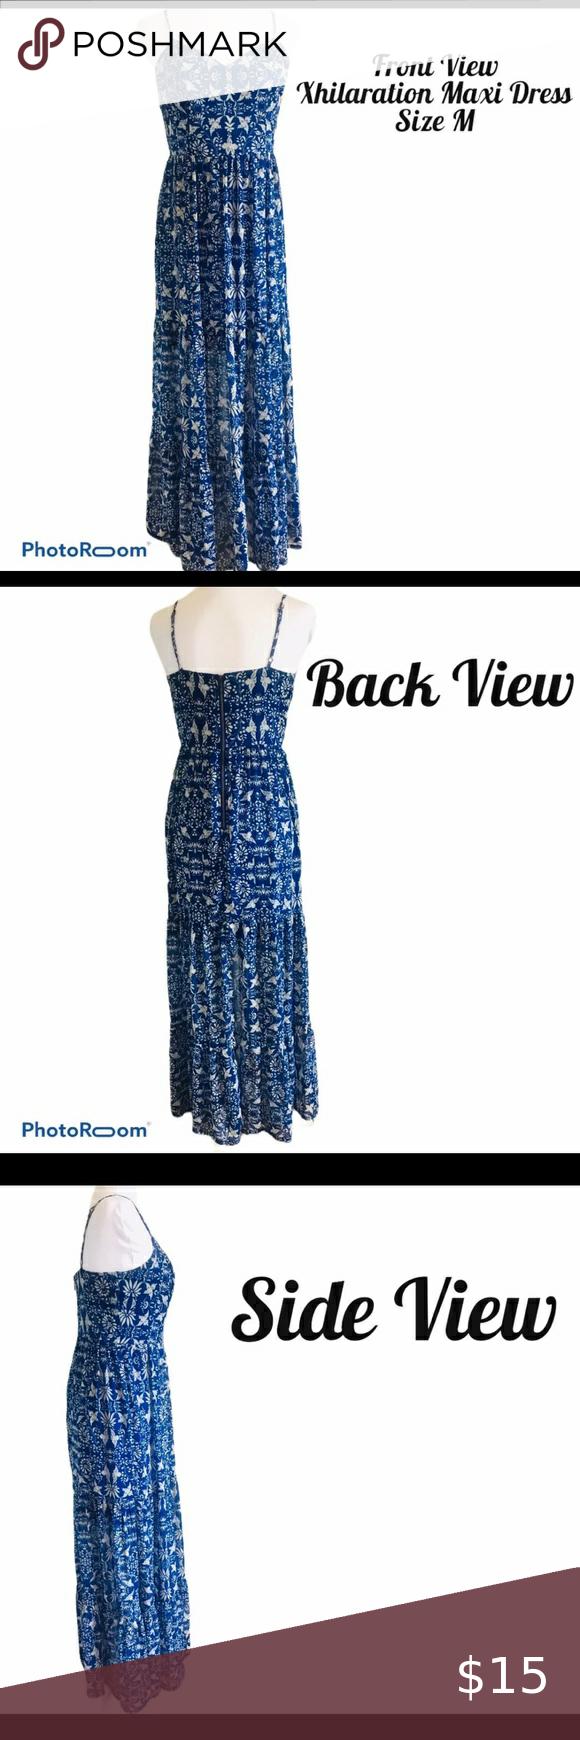 Xhilaration Maxi Dress W Adjustable Straps Size M Maxi Dress Xhilaration Maxi [ 1740 x 580 Pixel ]